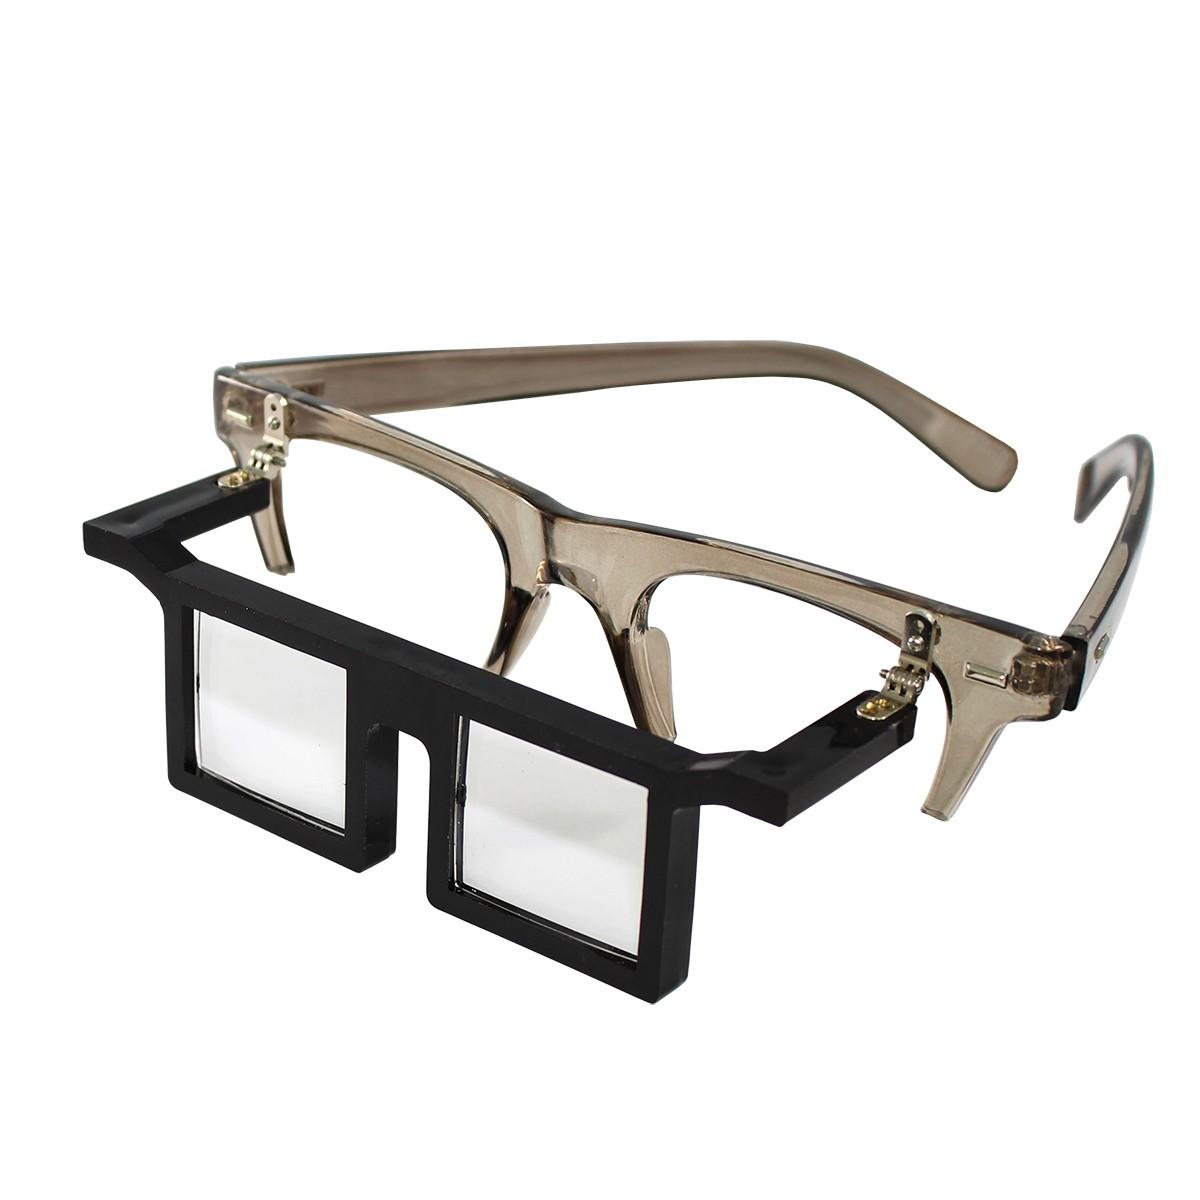 Half-Frame Telesight Magnifier - DA-3 / 43